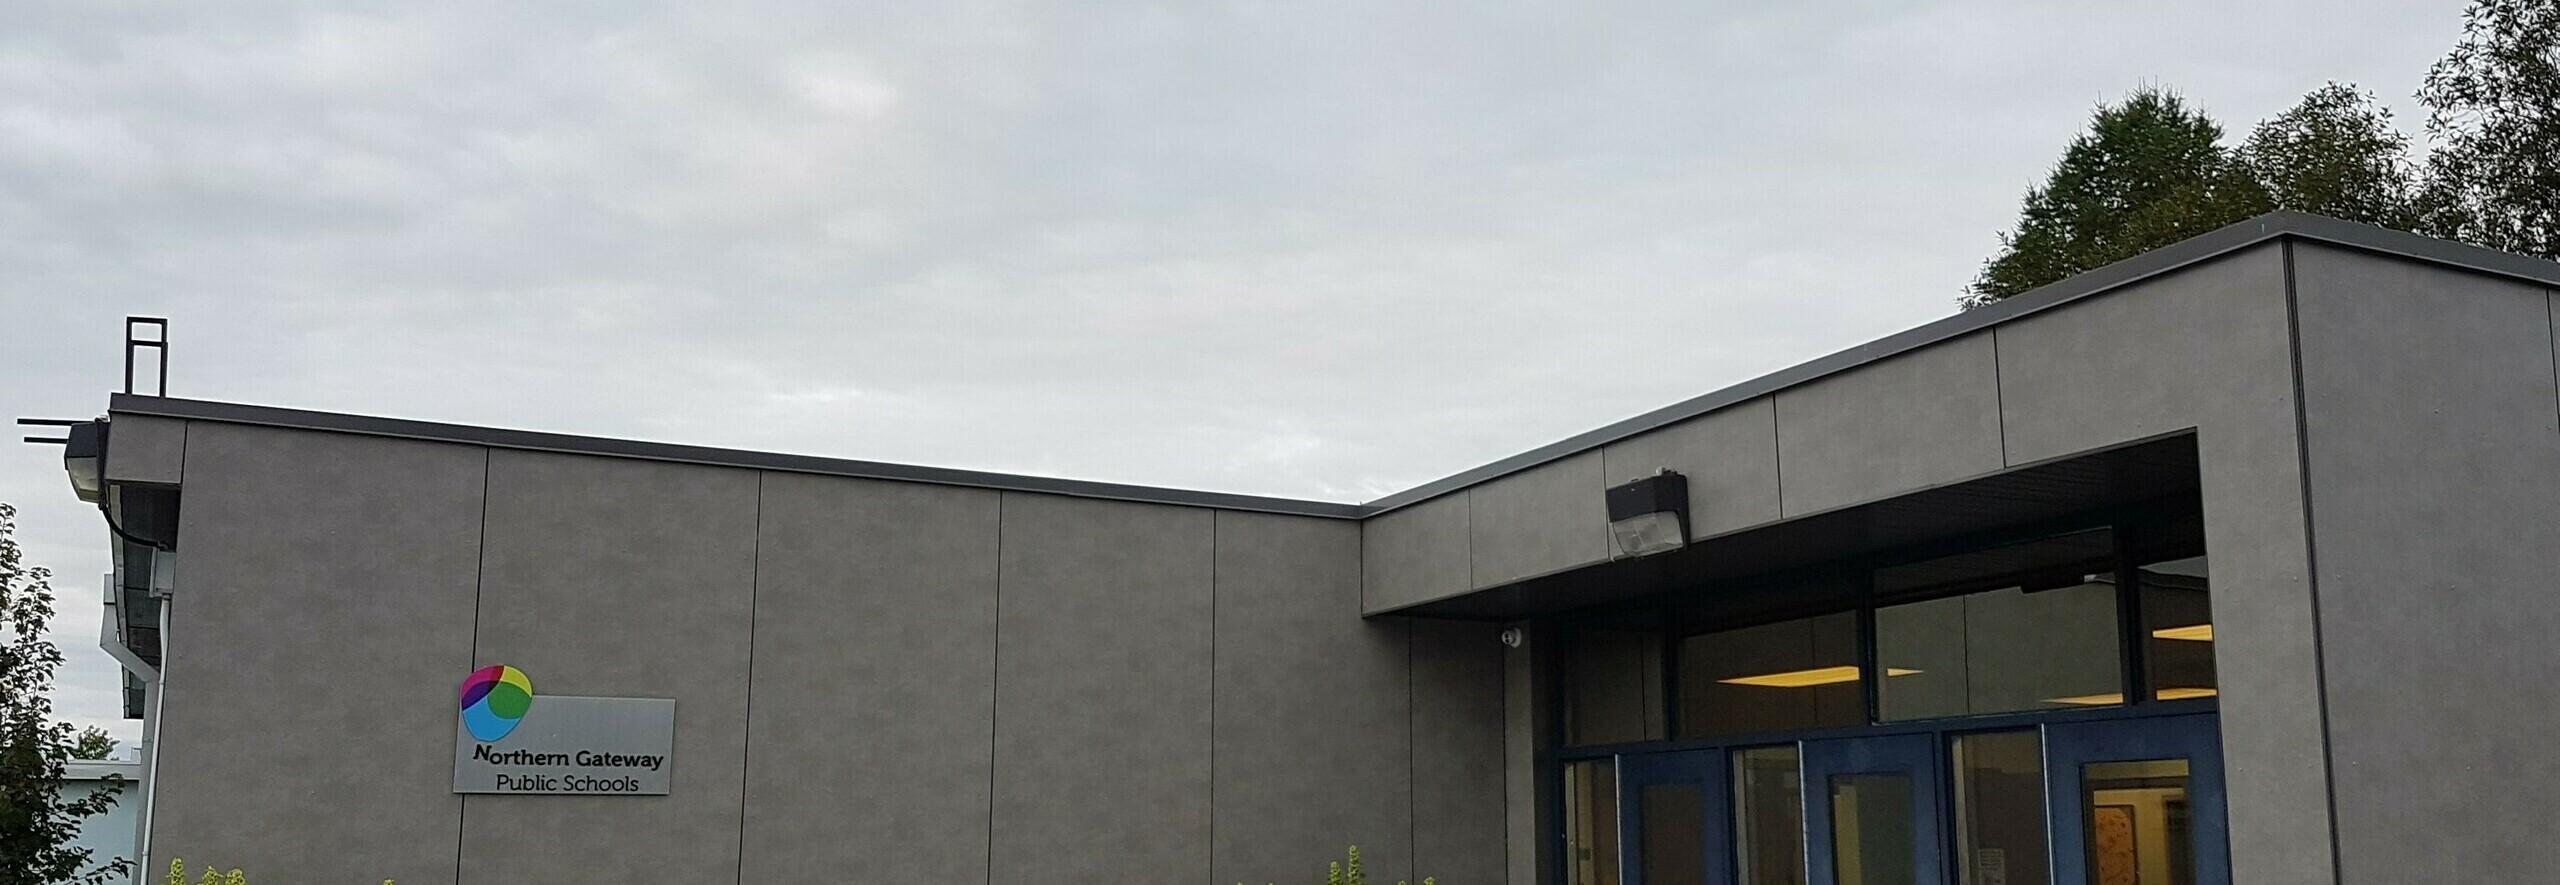 Sangudo Community School Banner Photo